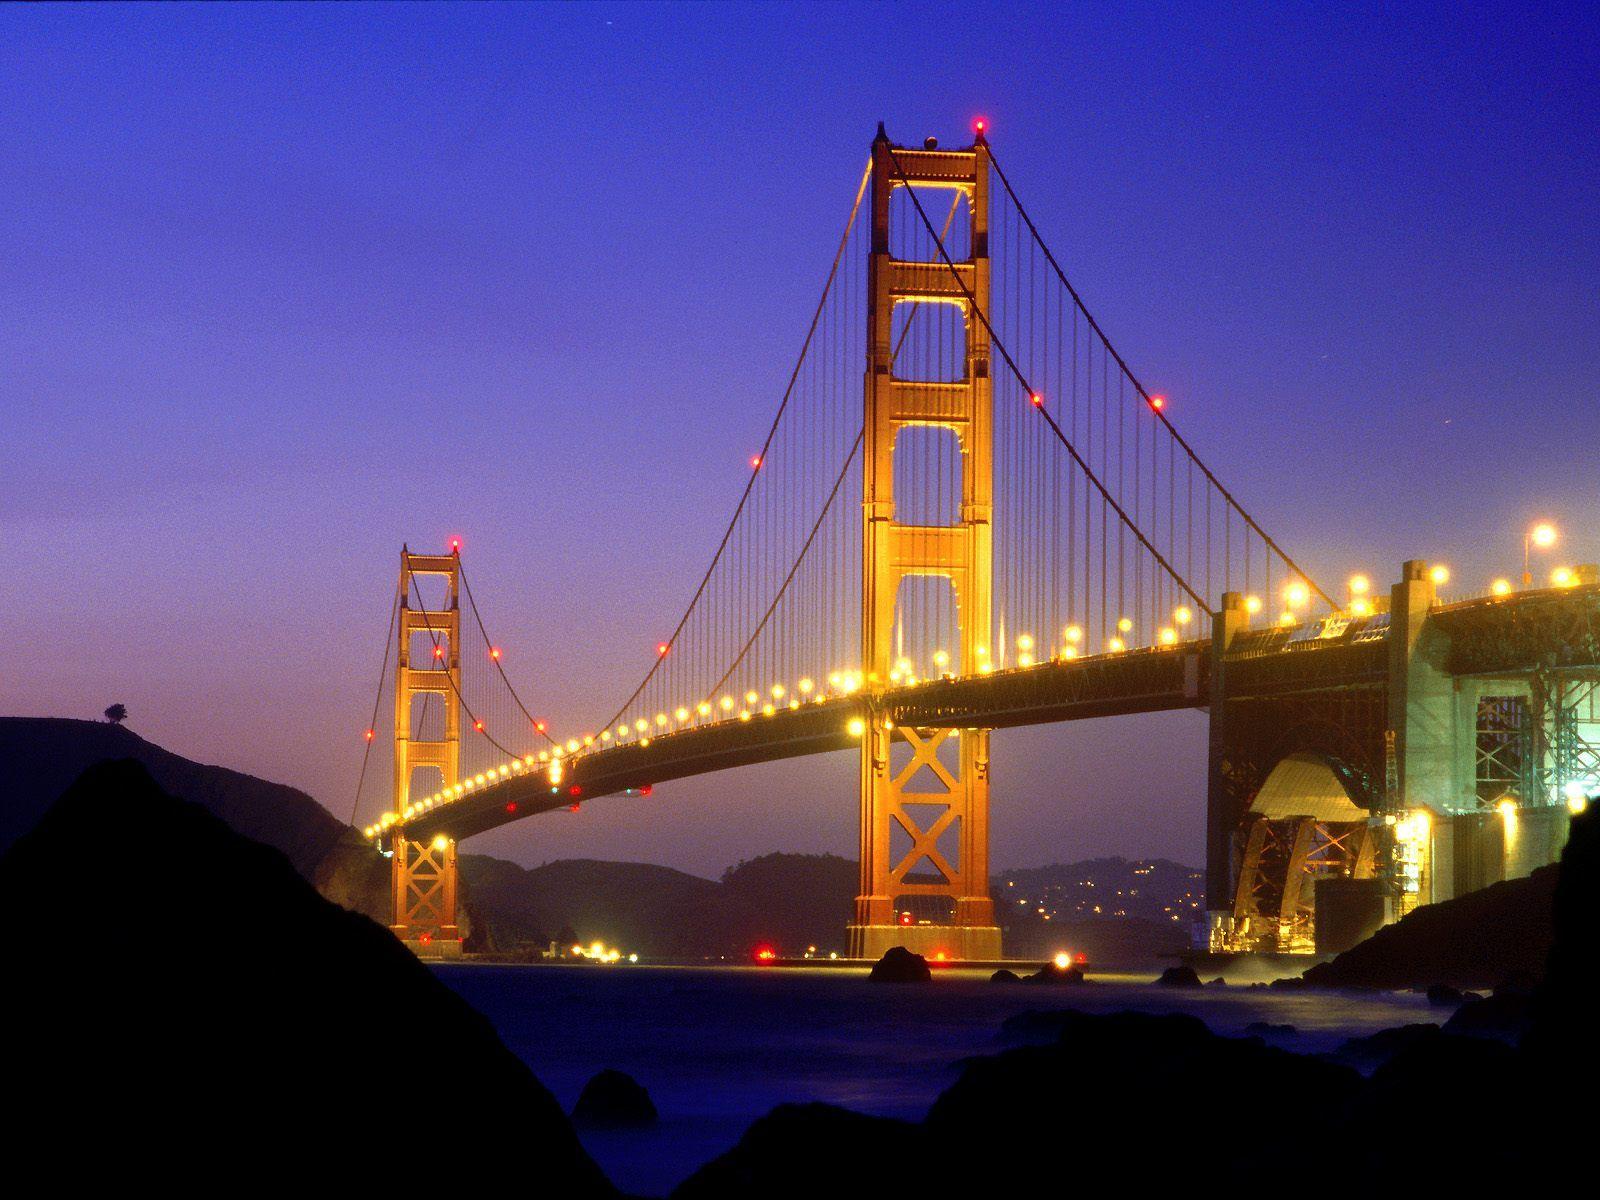 Must see Wallpaper Night Golden Gate Bridge - 0937b50834d5f4e713dd45f7542e62da  Best Photo Reference-42887.jpg